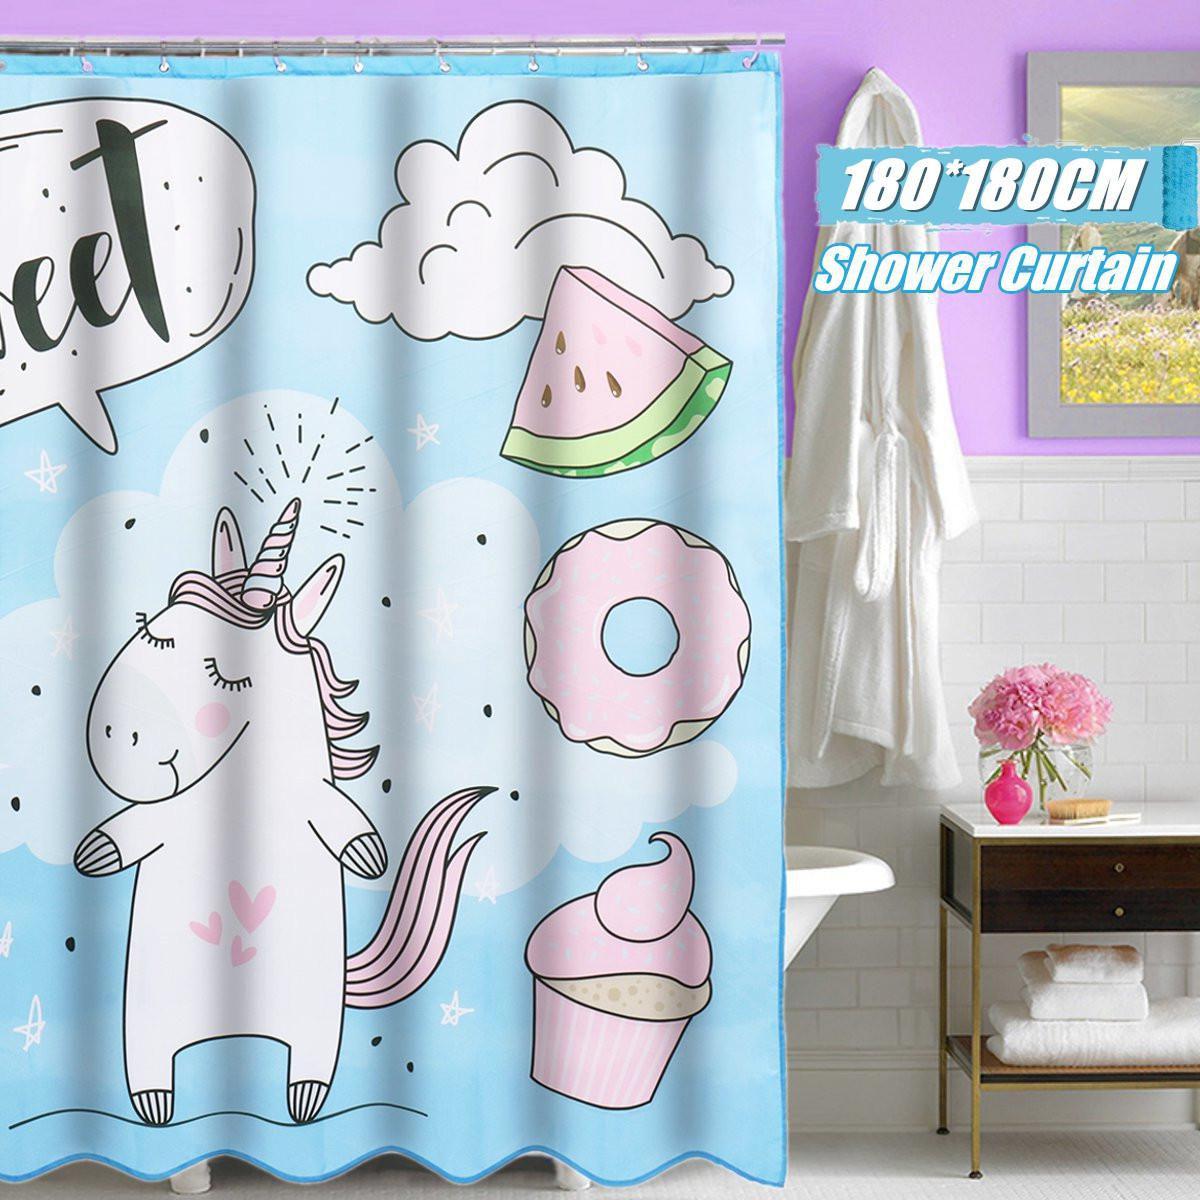 Buy 180 180cm Polyester Waterproof Bathroom Decor Shower